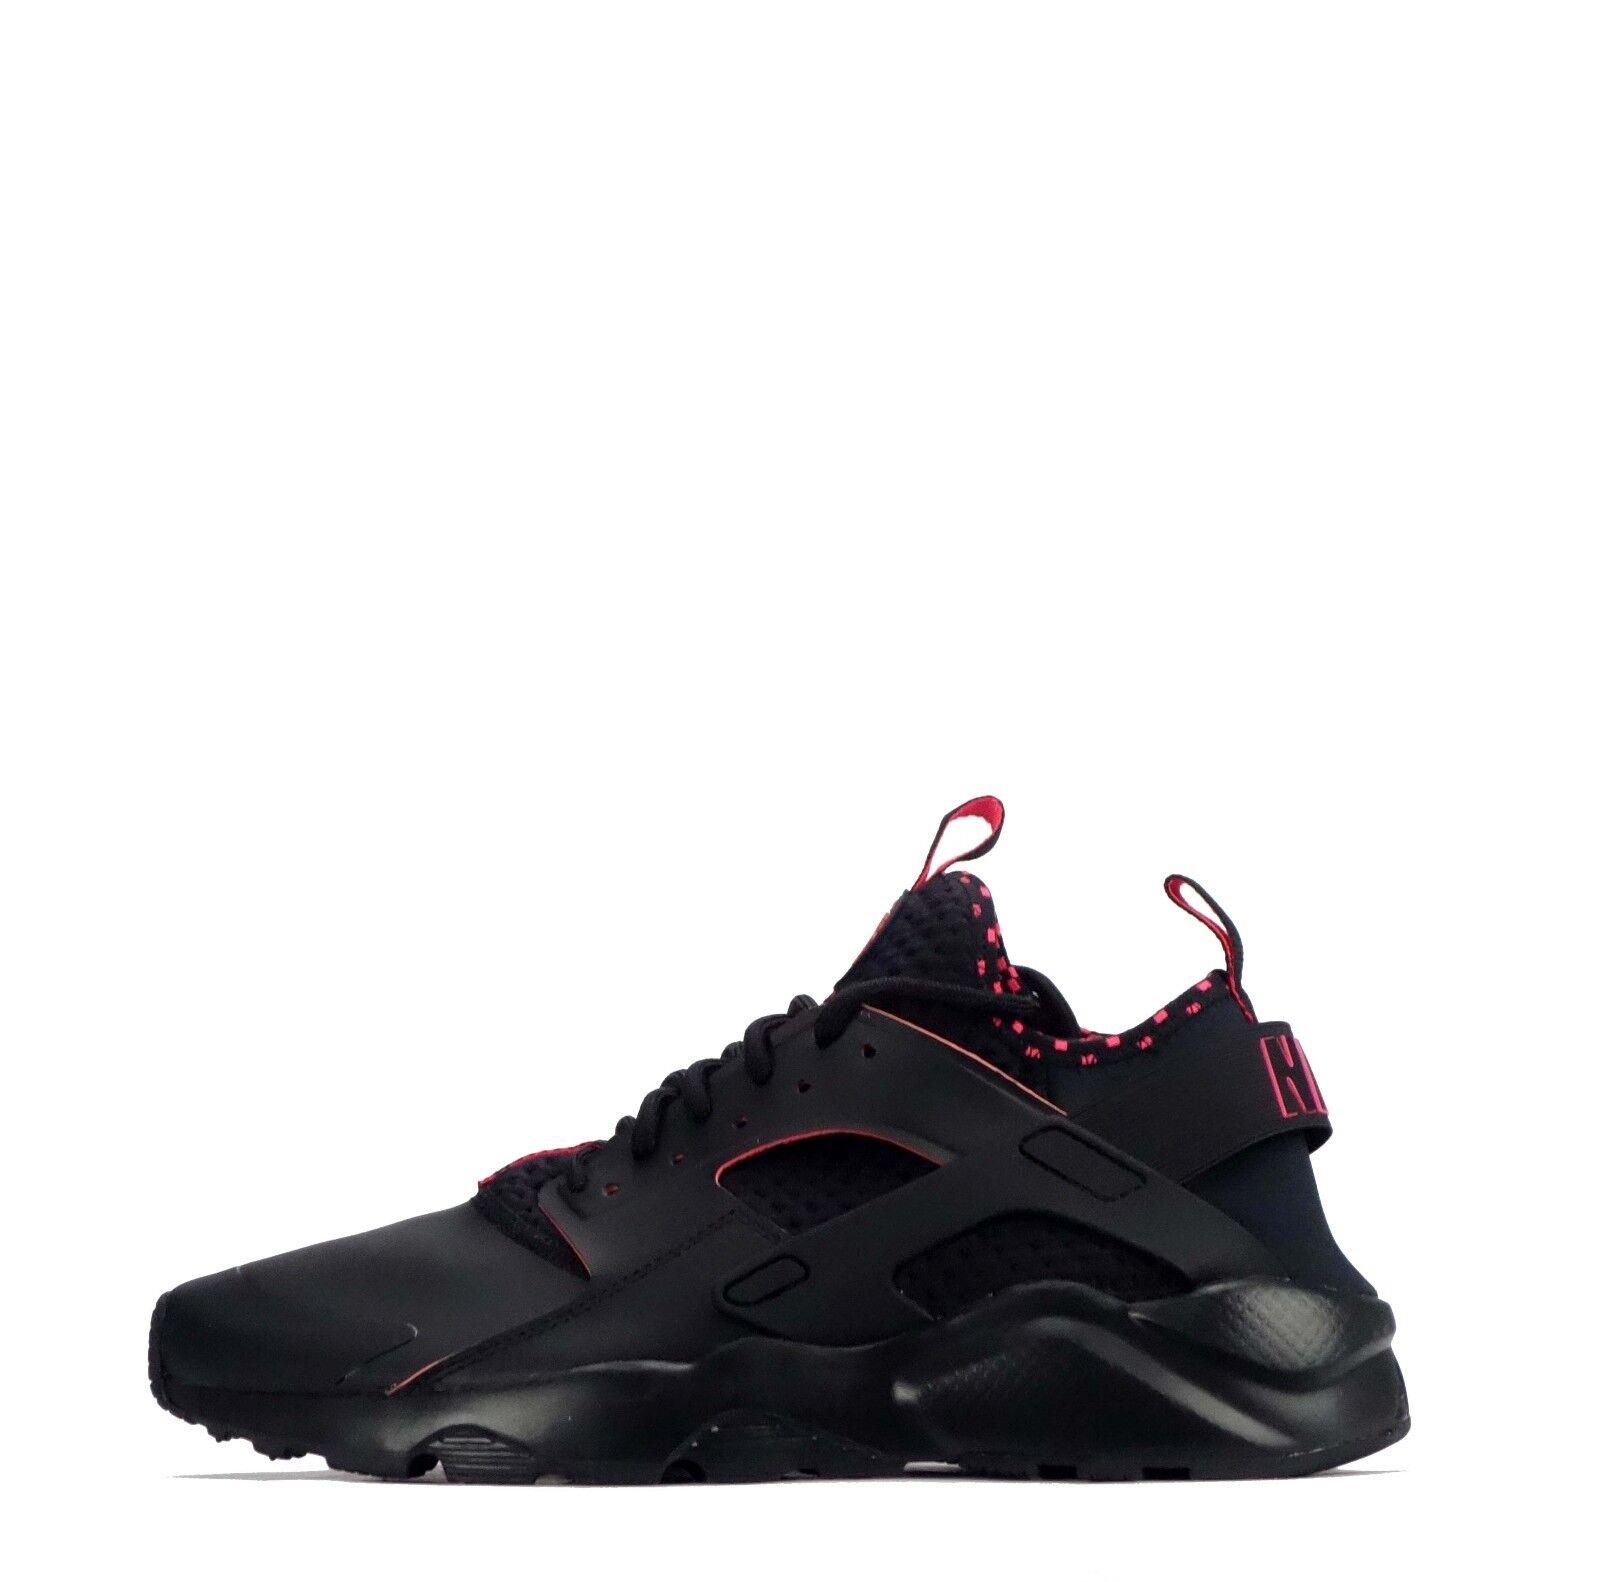 Nike Huarache Ultra Negro/Rojo SE Para Hombre Correr Air Negro/Rojo Ultra Solar tenis 7956dc